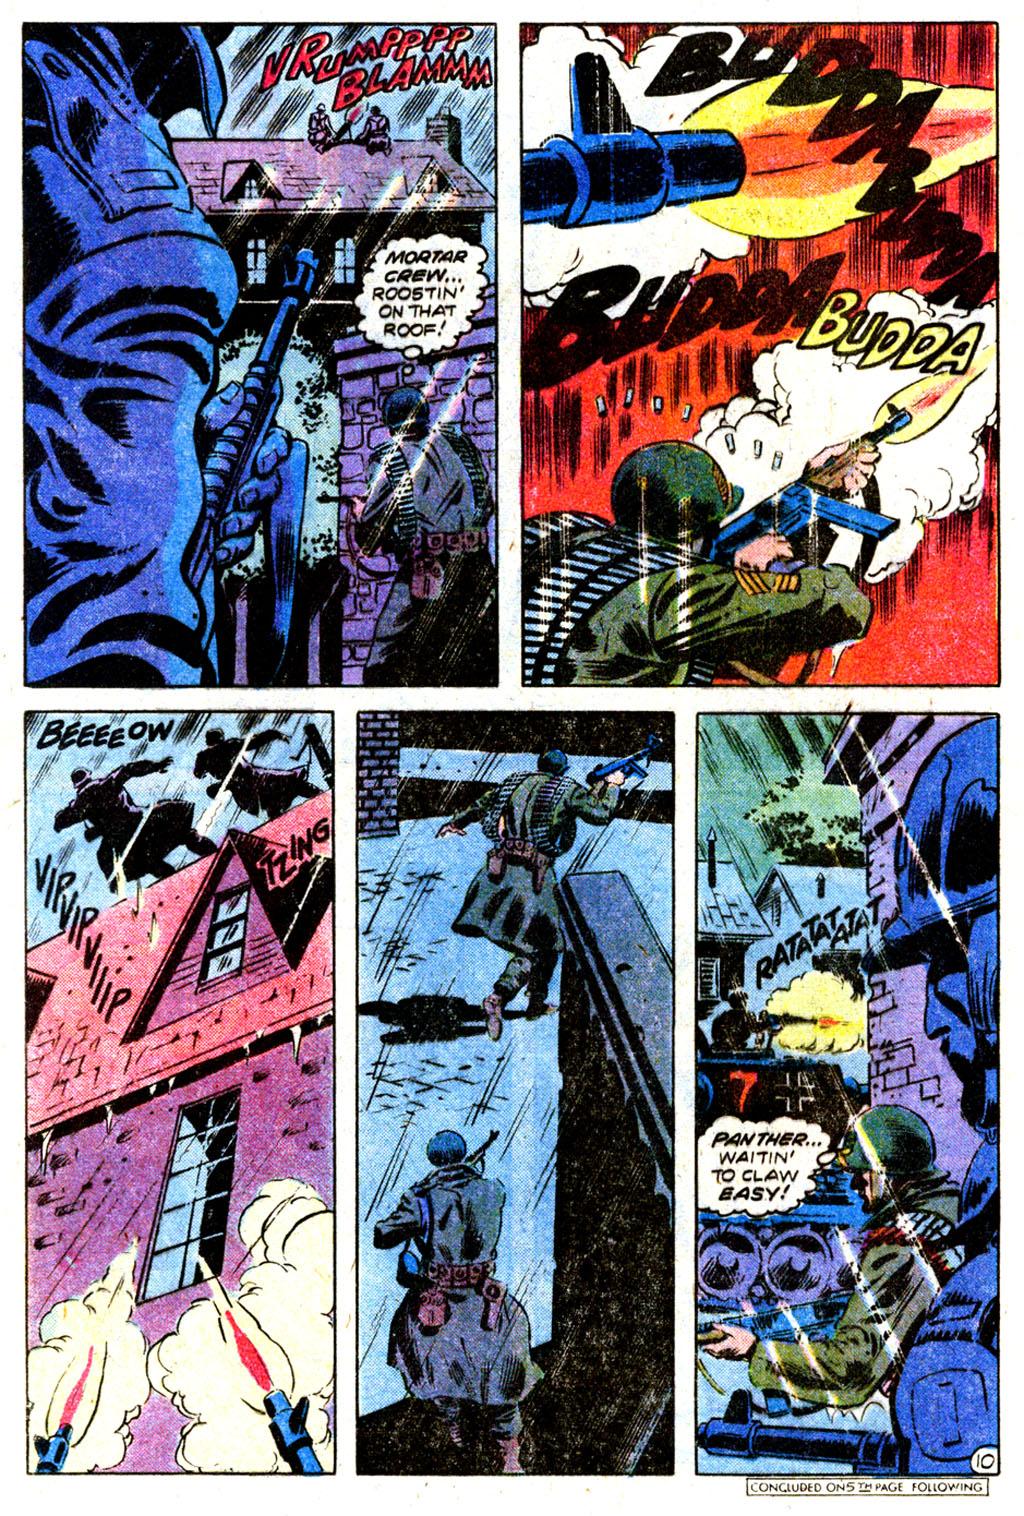 Read online Sgt. Rock comic -  Issue #340 - 11